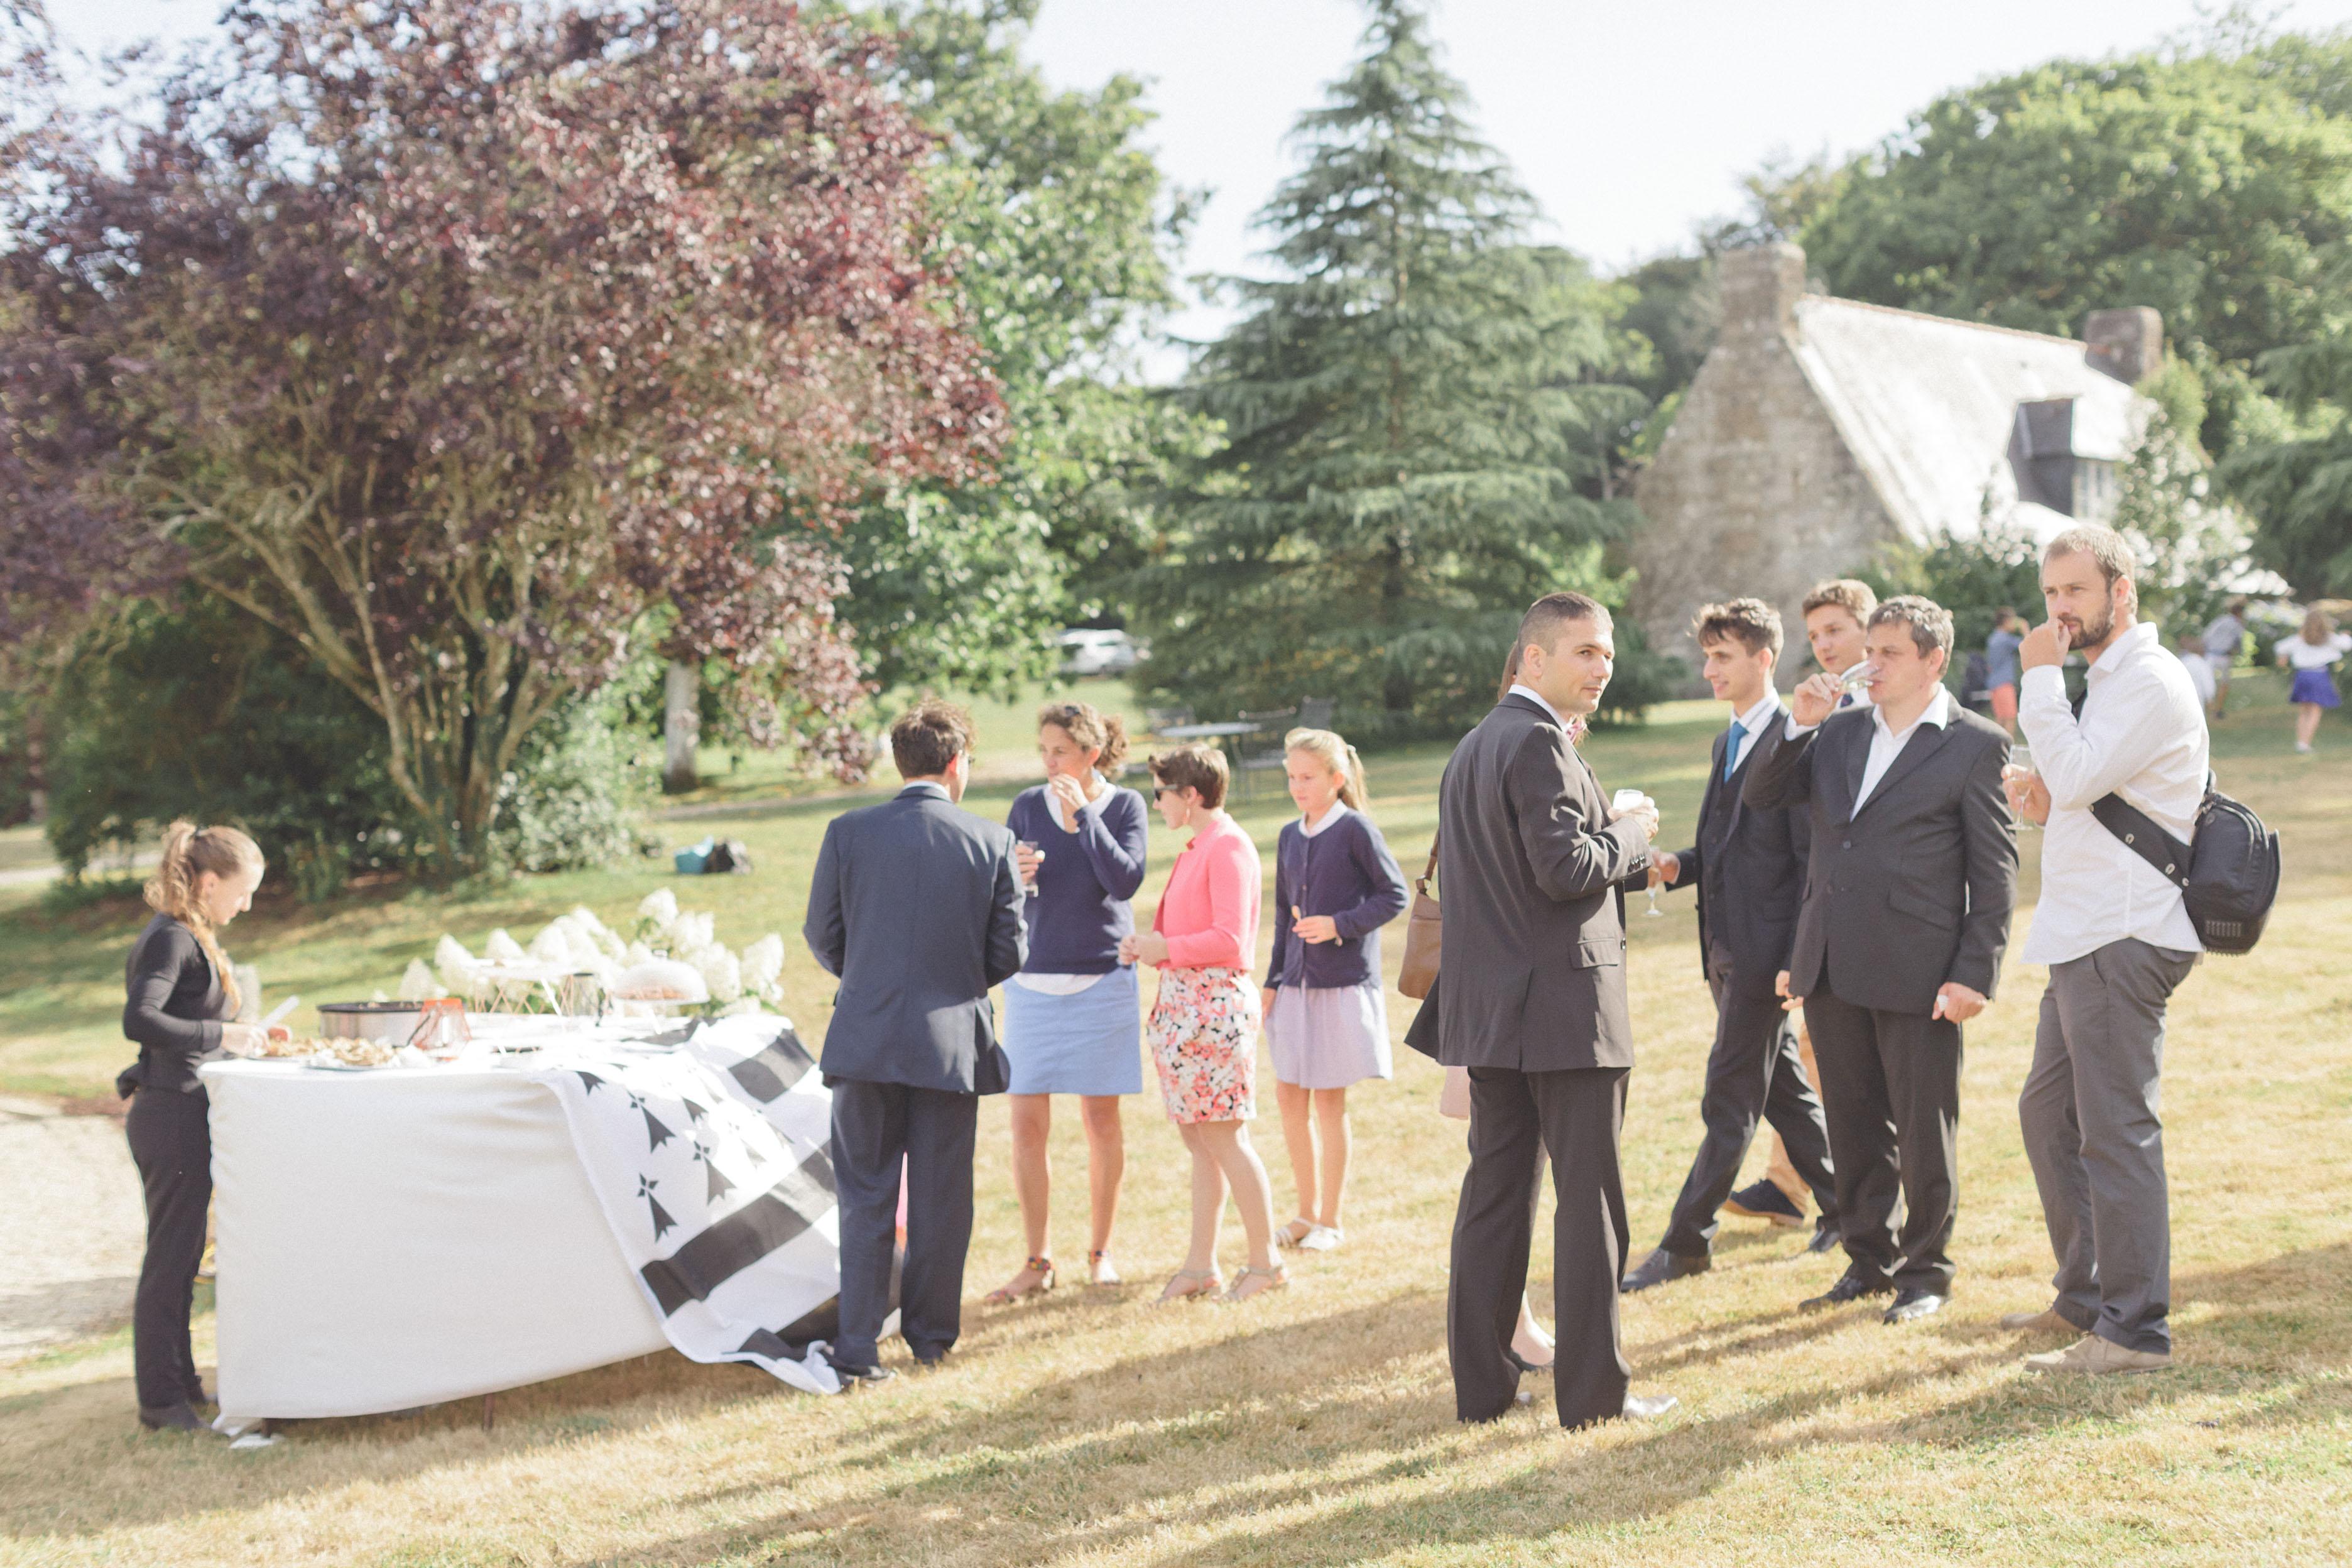 Photographie - Mariage - Bretagne - Finistere - Morbihan - Lilian Vezin Photographie (56)